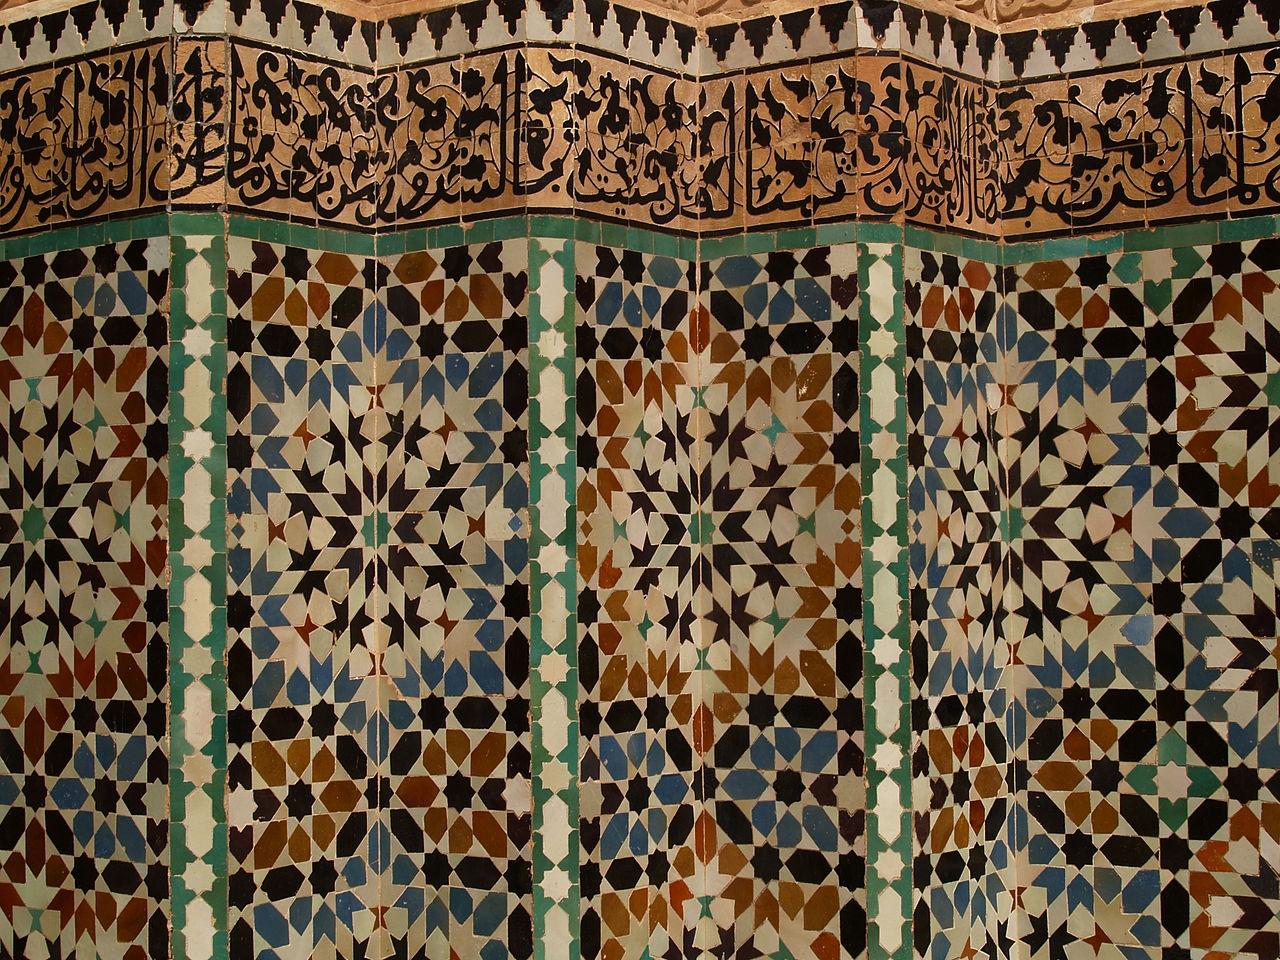 Fliesentrends 2016: Holzoptik, Struktur, Mosaik oder XXL